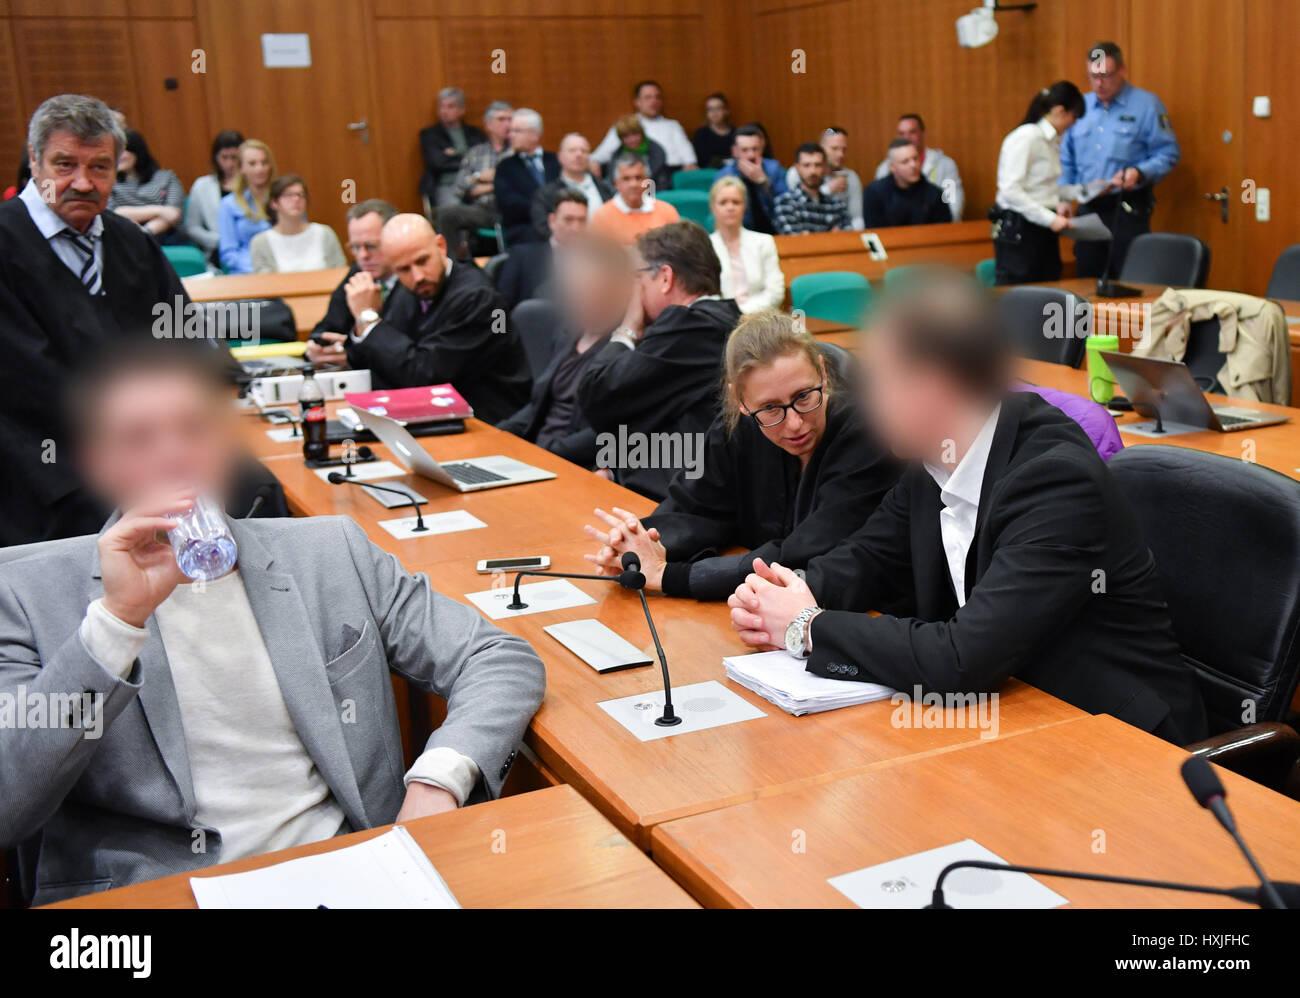 Frankfurt, Germany. 29th Mar, 2017. Stephan S. (4-L) and Jonas K. (R), the founders of the Frankfurt-based real Stock Photo